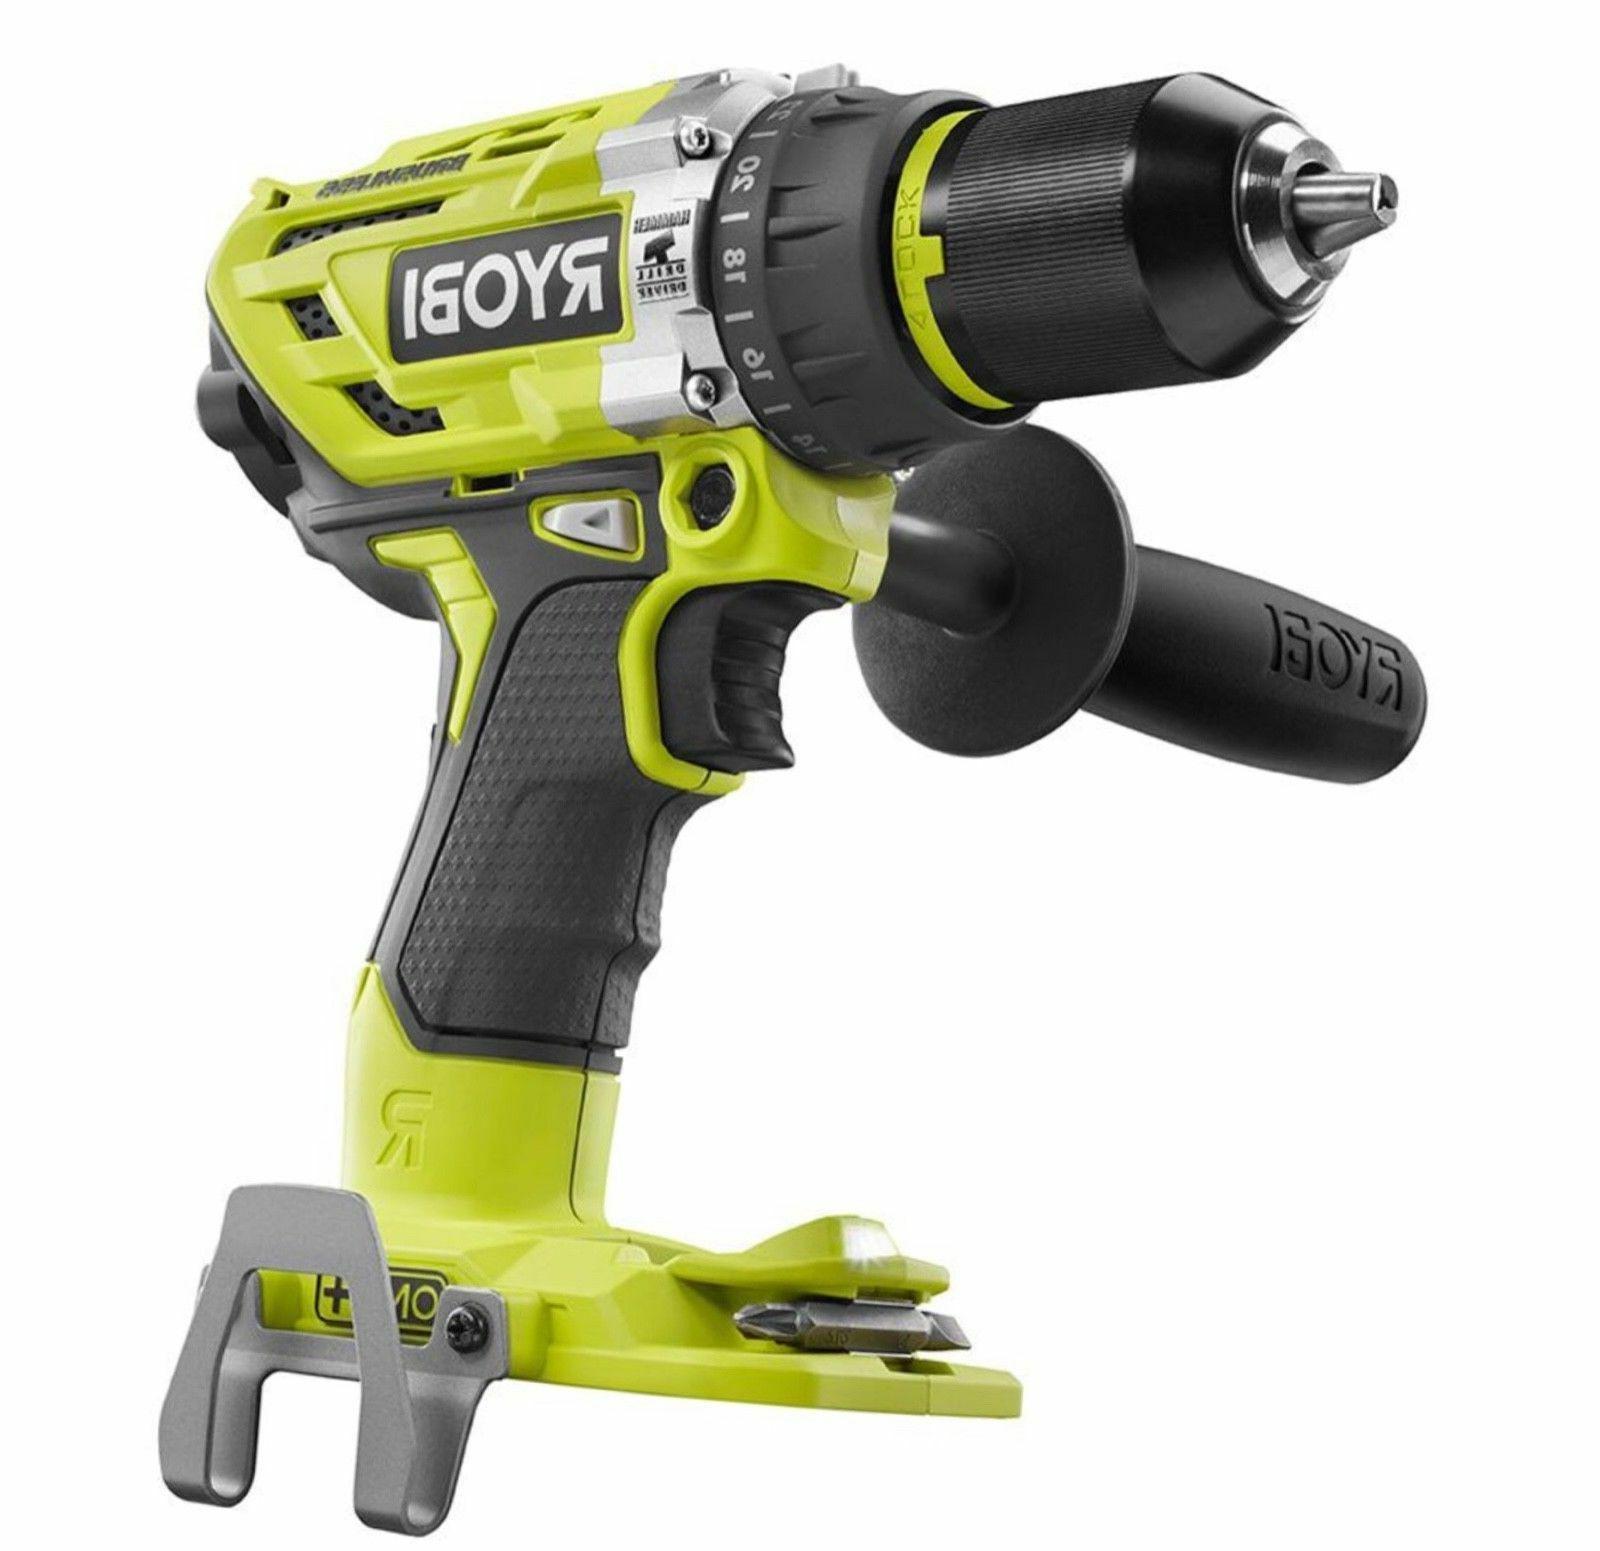 "New Ryobi P251 + 18V 18 Volt 1/2"" Brushless Hammer"